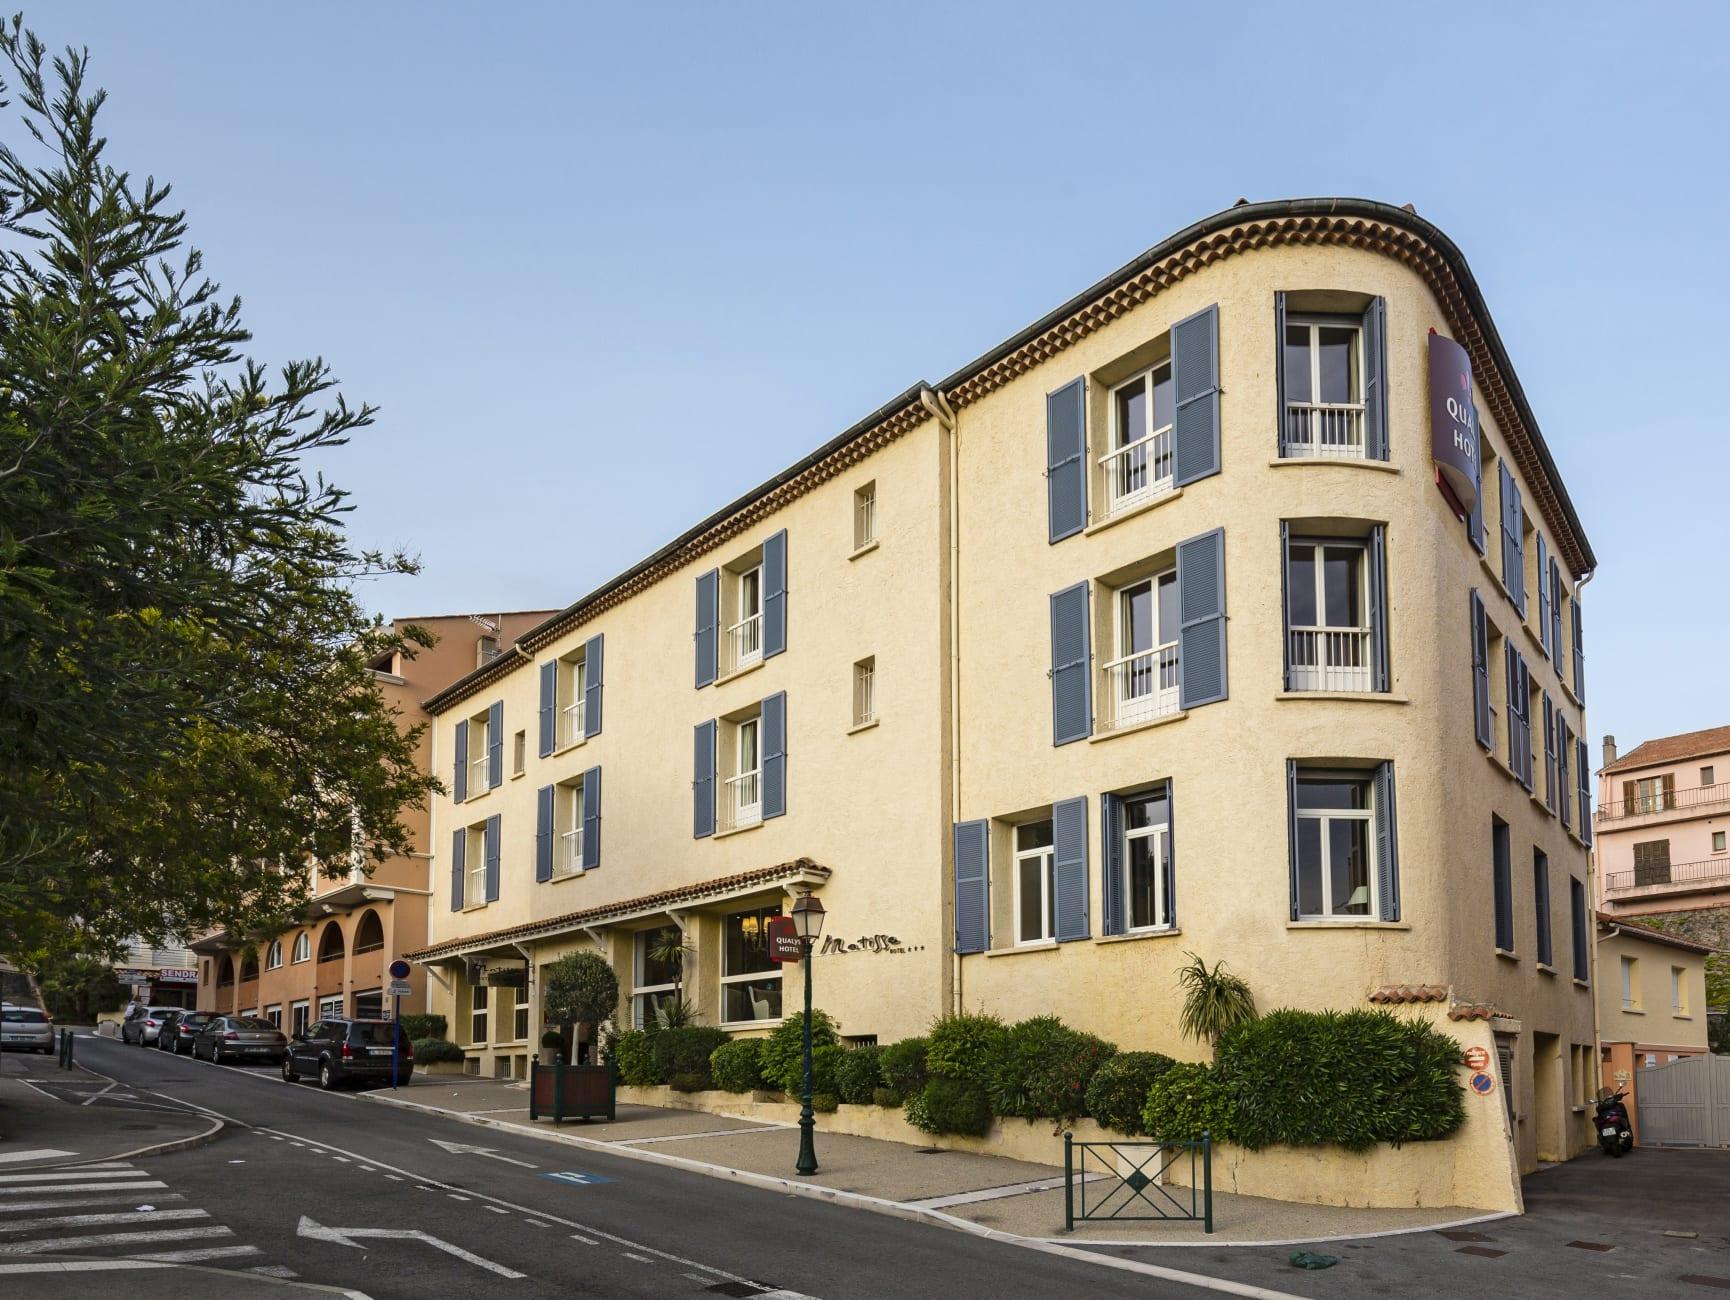 Otel Hotel Matisse, Sure Hotel Collection By Best Western ... dedans Hotel Les Jardins De Sainte Maxime